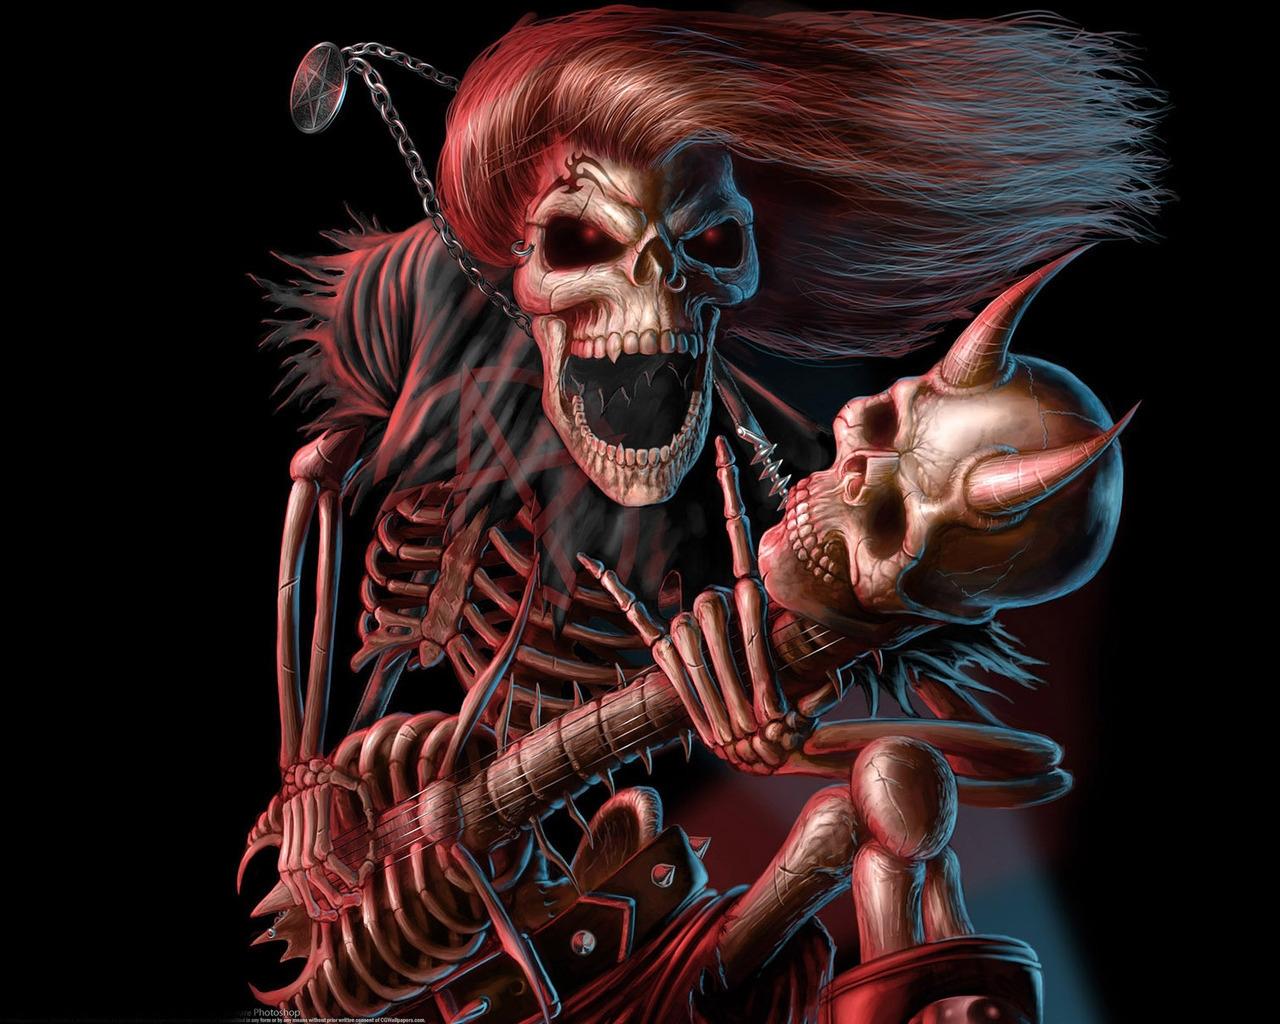 http://3.bp.blogspot.com/-vWHIo77kwFo/TqPQ8jpmnTI/AAAAAAAACqE/XBEh0u0NAAE/s1600/Skull%2B_wallpapers_Skull_Guitarist_Pentagram.jpg